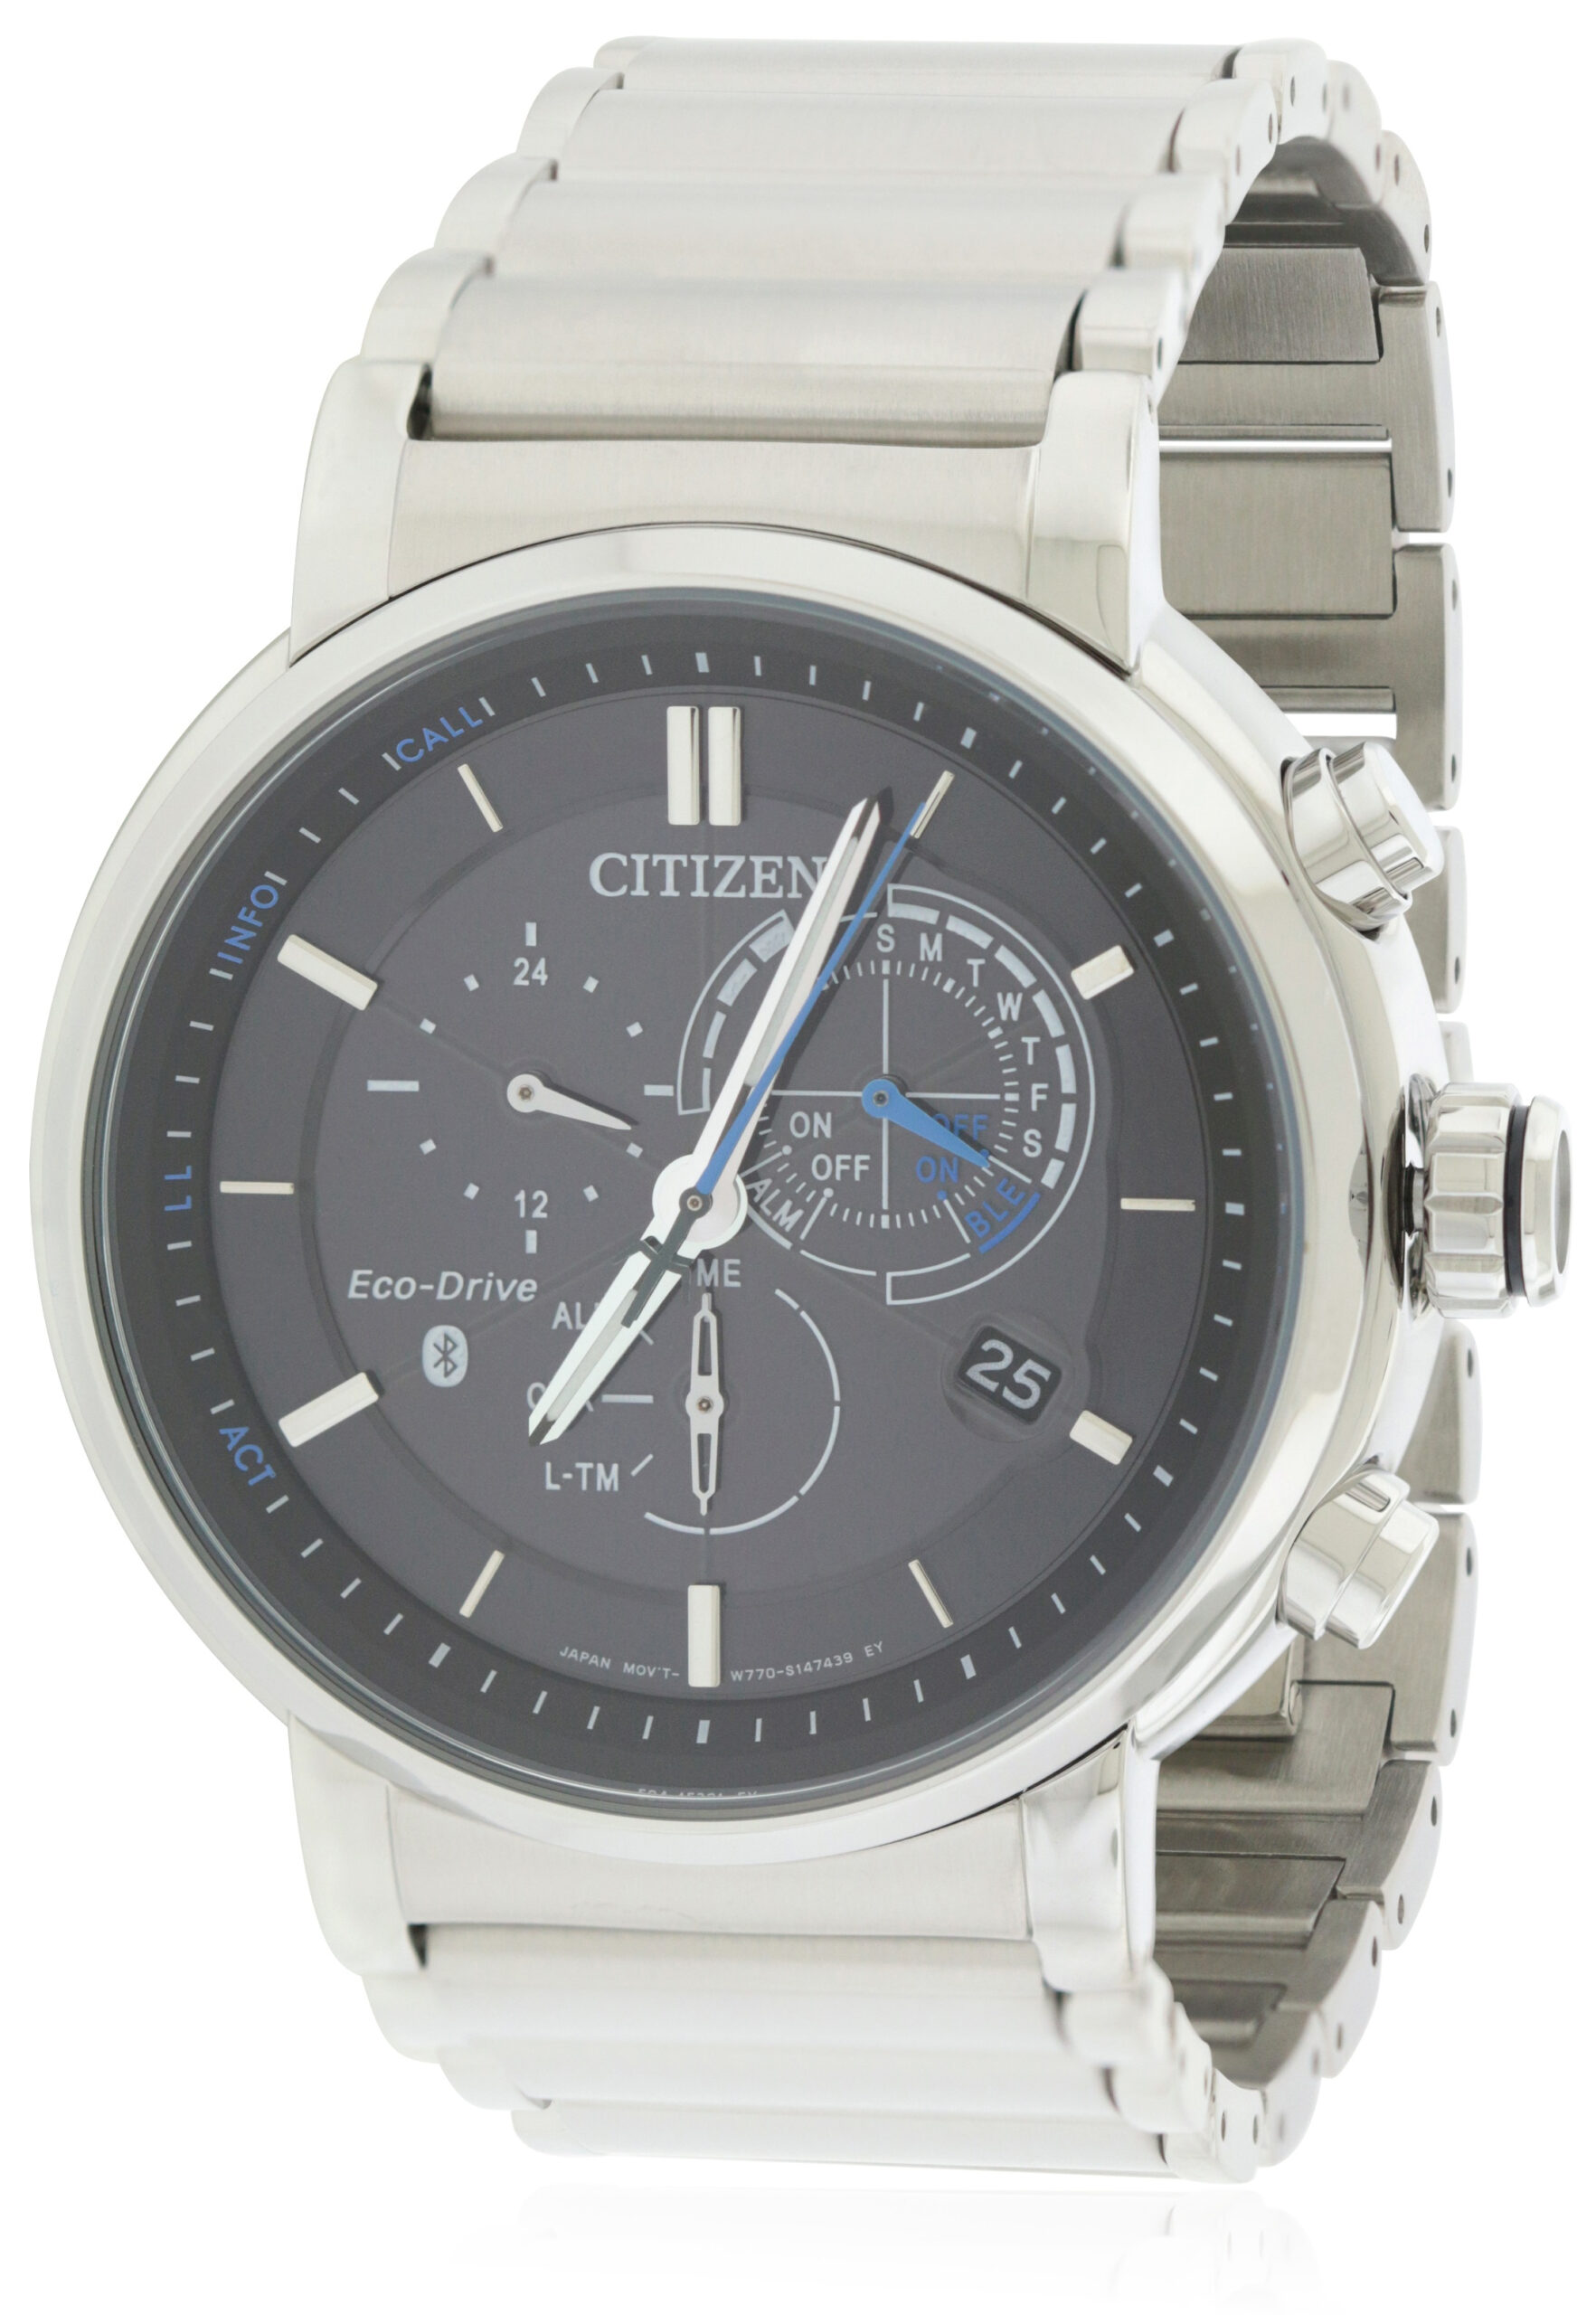 Citizen Eco-Drive Proximity Chronograph Perpetual Mens within Citizen Eco Drive Chronograph Wr100 Manual